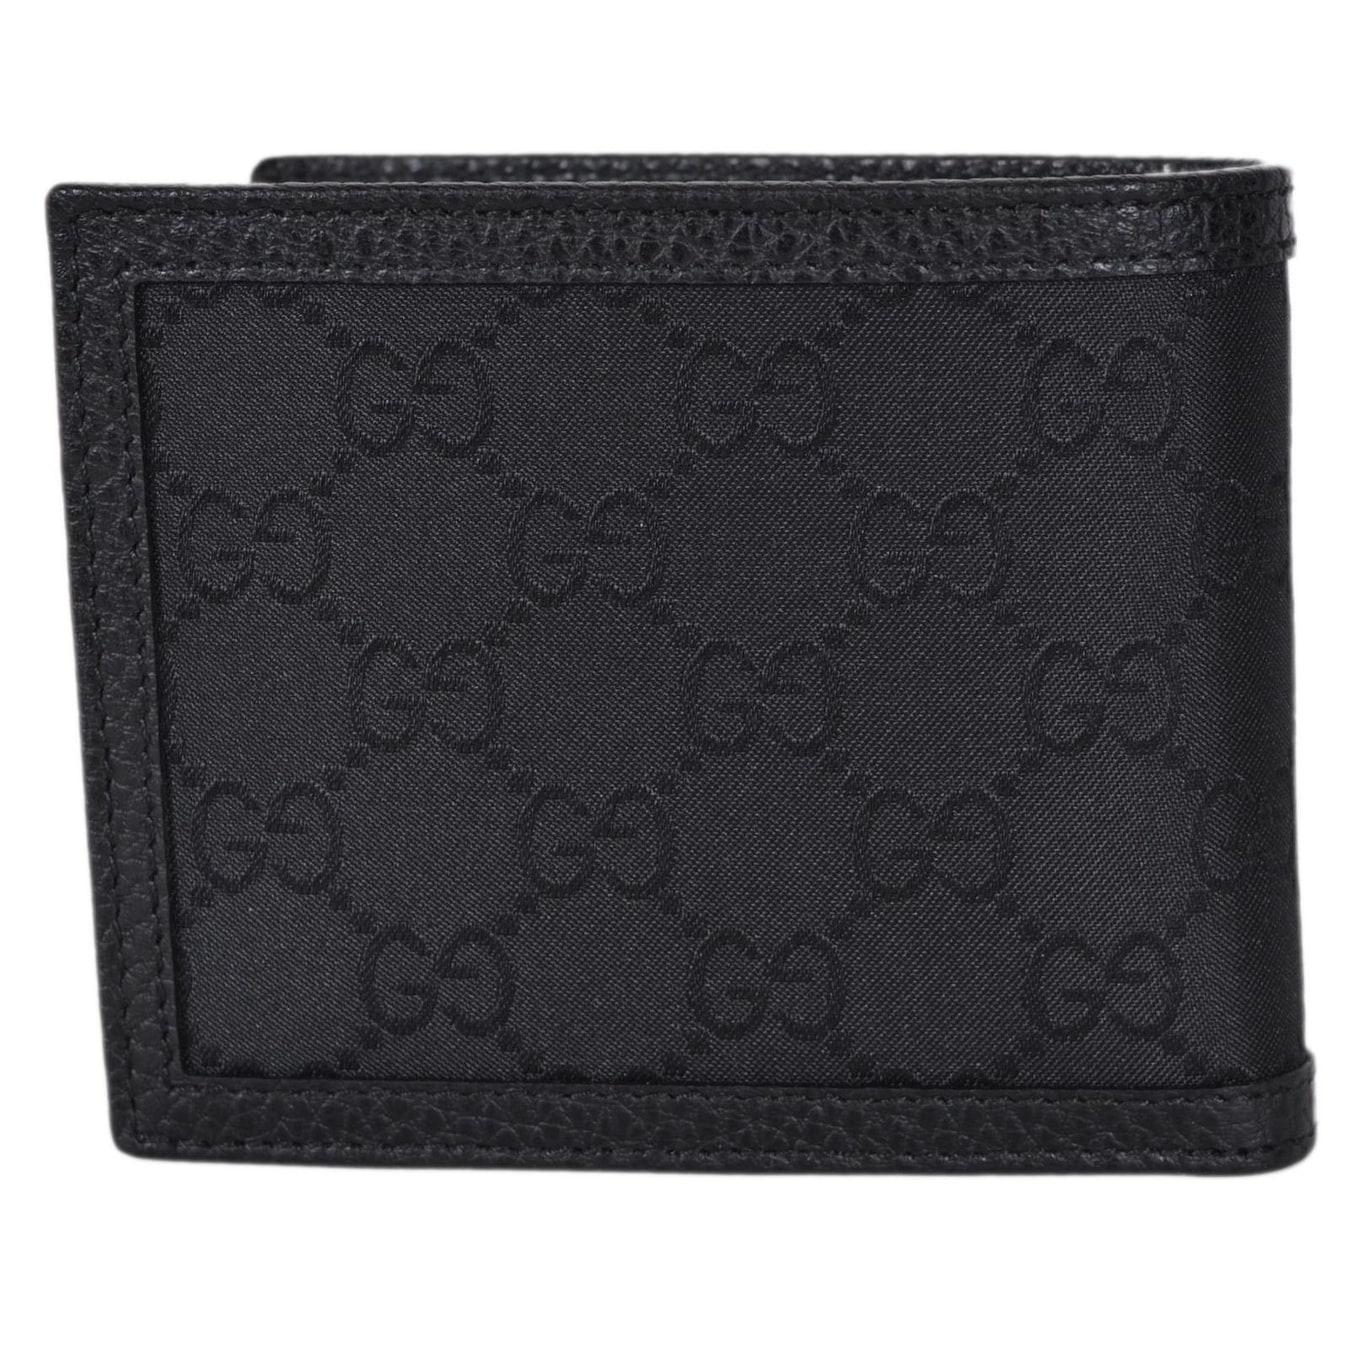 923b465fdb77 Shop Gucci Men's 260987 Black Nylon Web Detail GG Guccissima Bifold Wallet  - Free Shipping Today - Overstock - 22081351